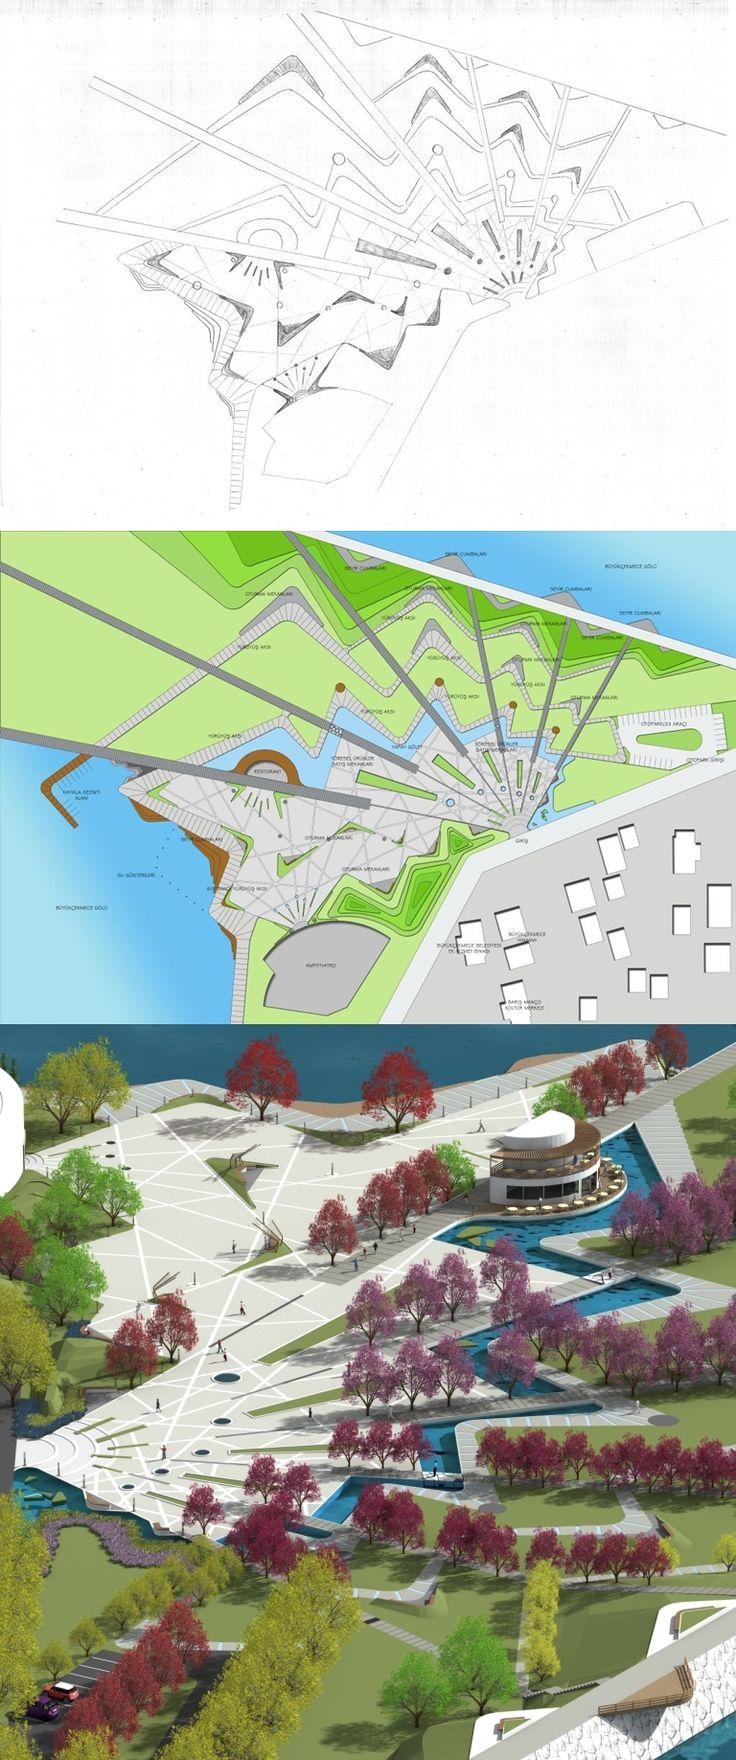 #Landscape #Architecture #Design #Sketch   Doruk Görkem ÖZKAN